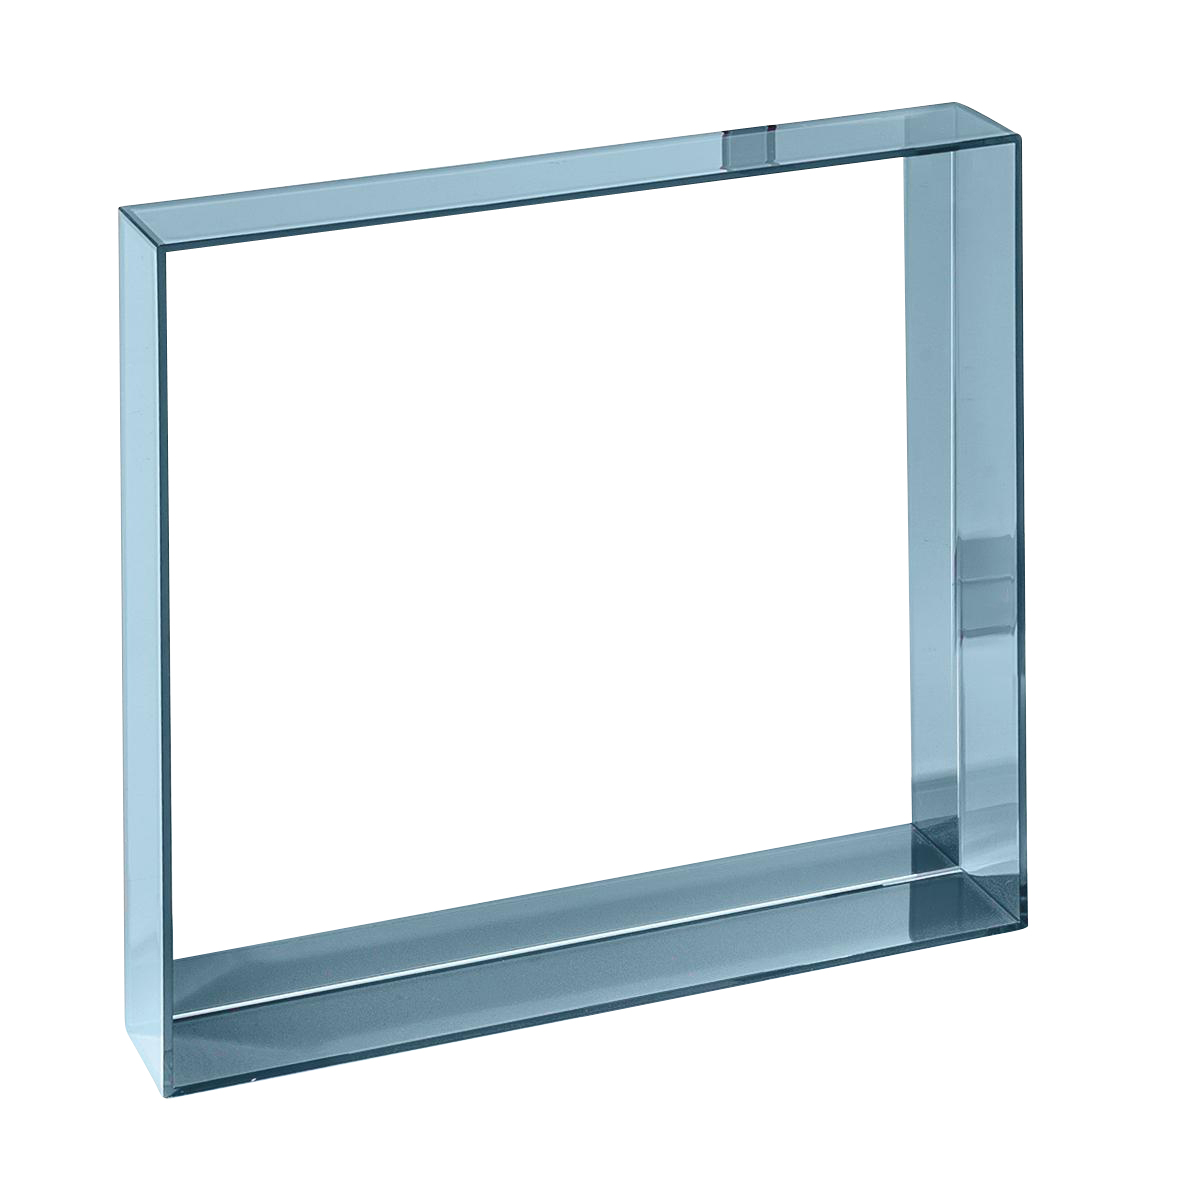 Kartell - Only Me Spiegel 50x50 - blau/transparent | Flur & Diele | Kartell